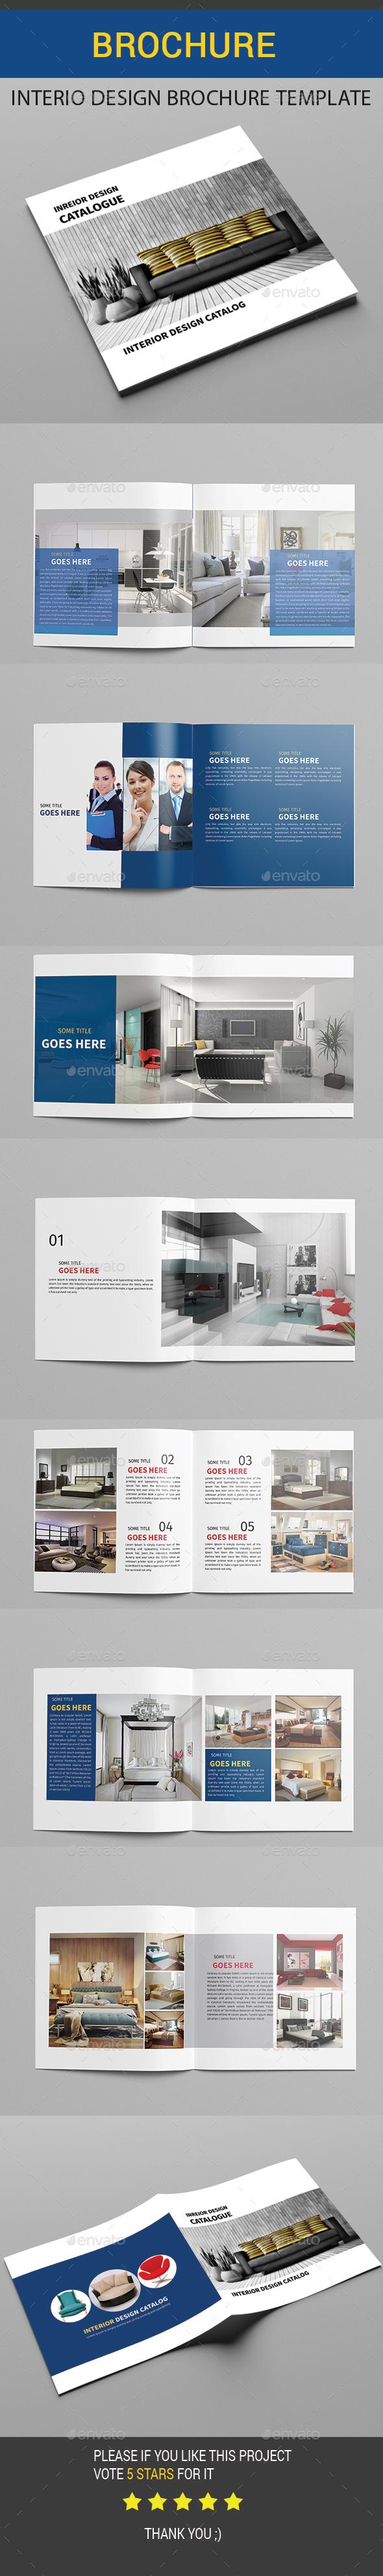 Interio Design Brochure Template - Brochures Print